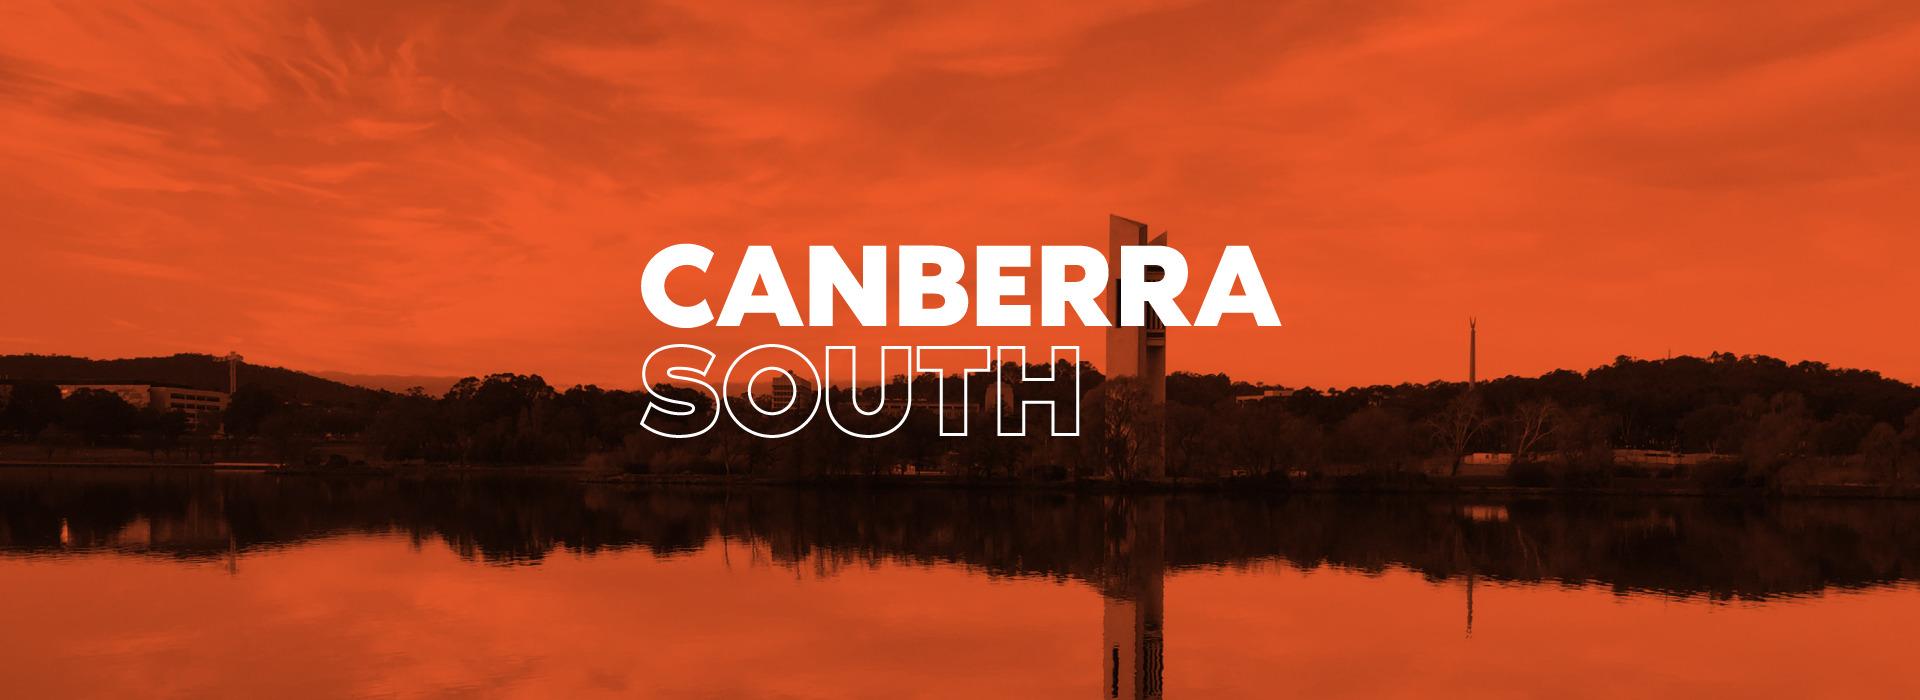 Canberra South Main image photo of lake